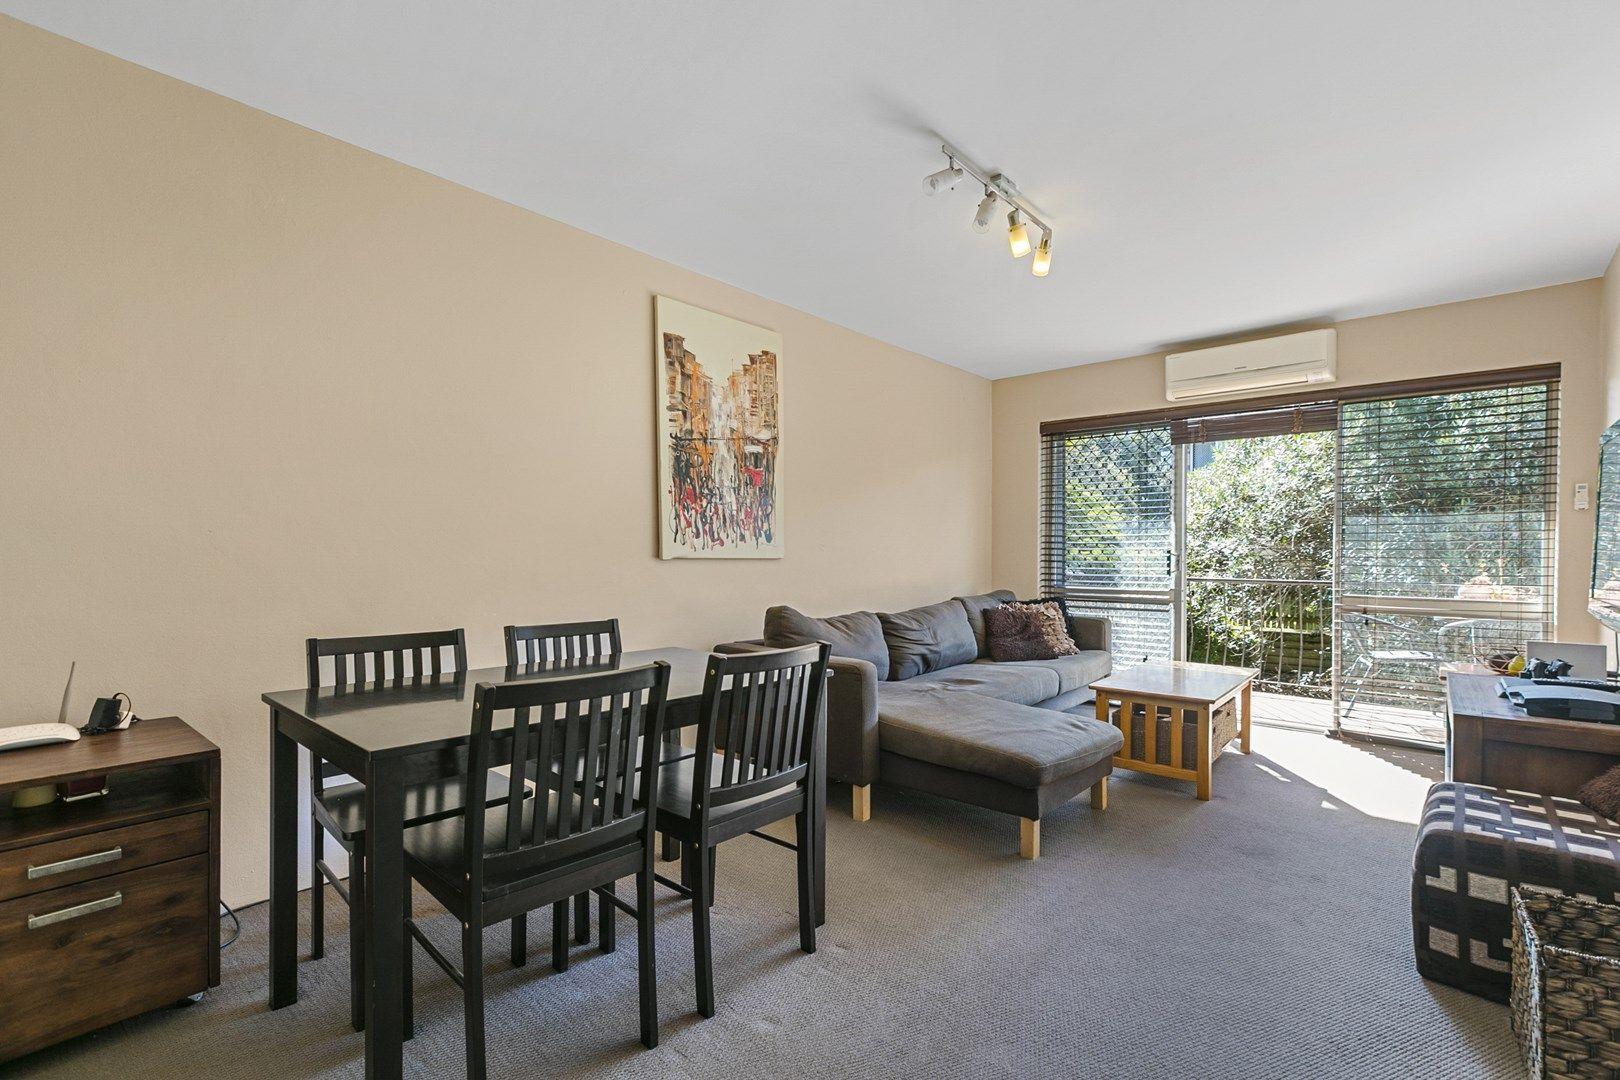 2/51 Gustavson Street, Annerley QLD 4103, Image 0